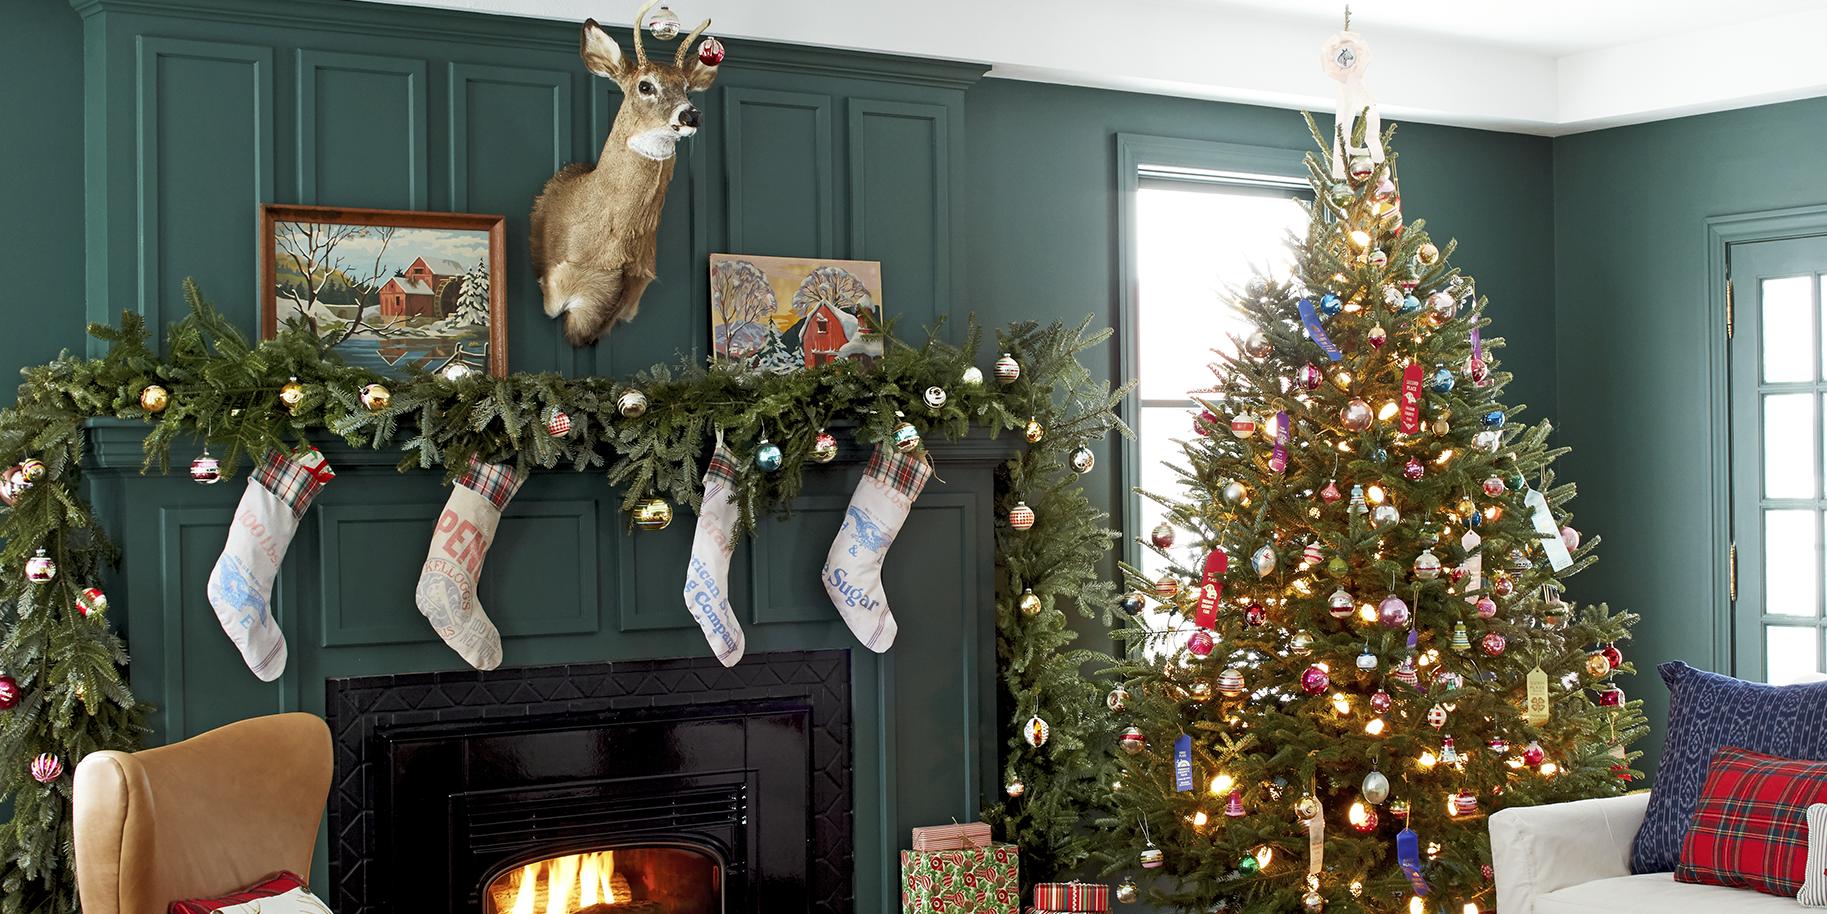 christmas tree decorating ideas & 72 Best Christmas Tree Decorating Ideas - How to Decorate a ...